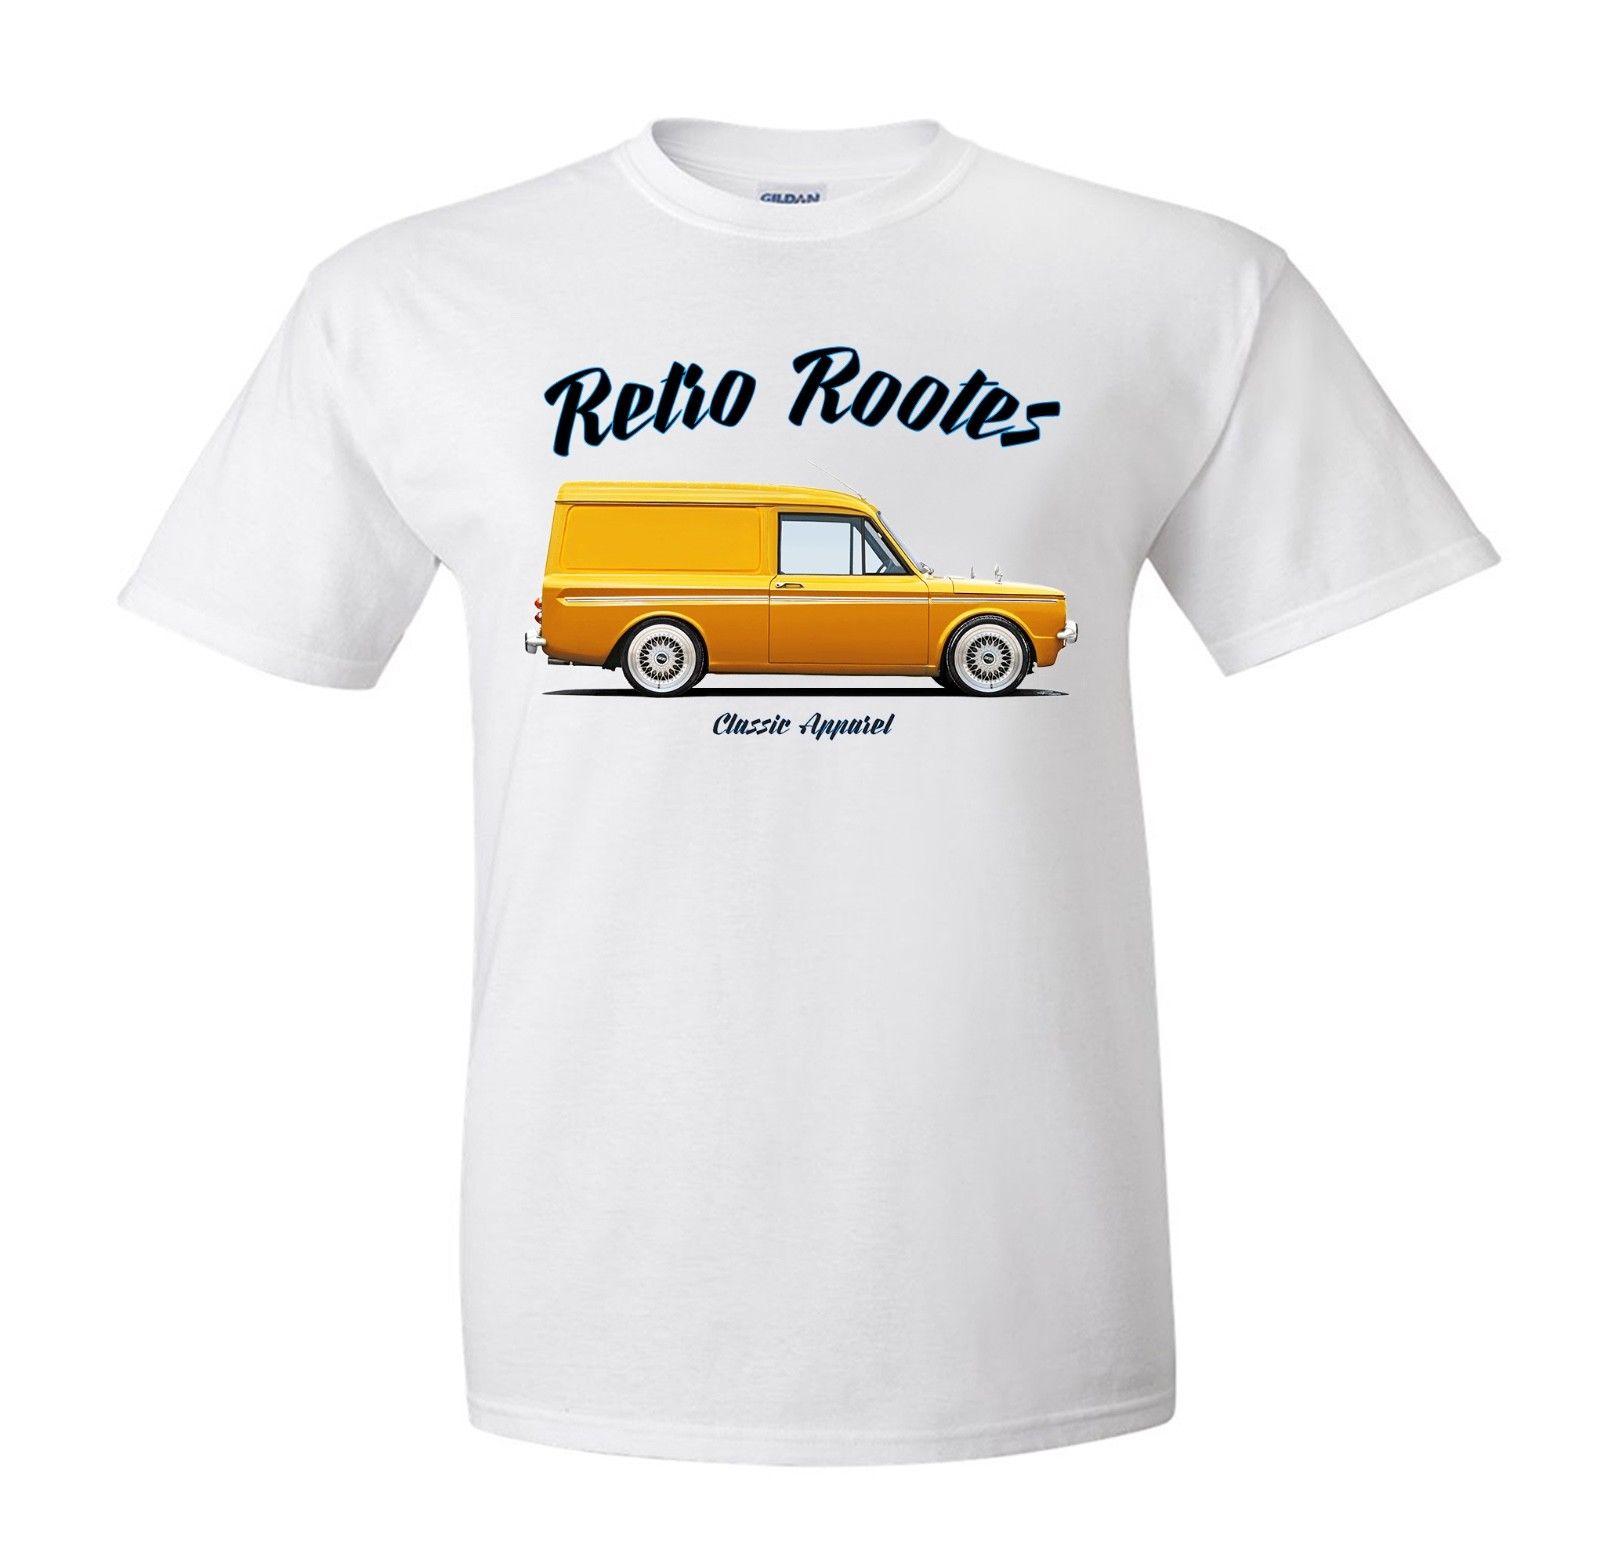 Nueva marca de moda camiseta de Hip Hop Hillman Imp Husky Van camiseta. Grupo de Fans de coches clásicos franceses Retro. ¿Modificado? Homme traje